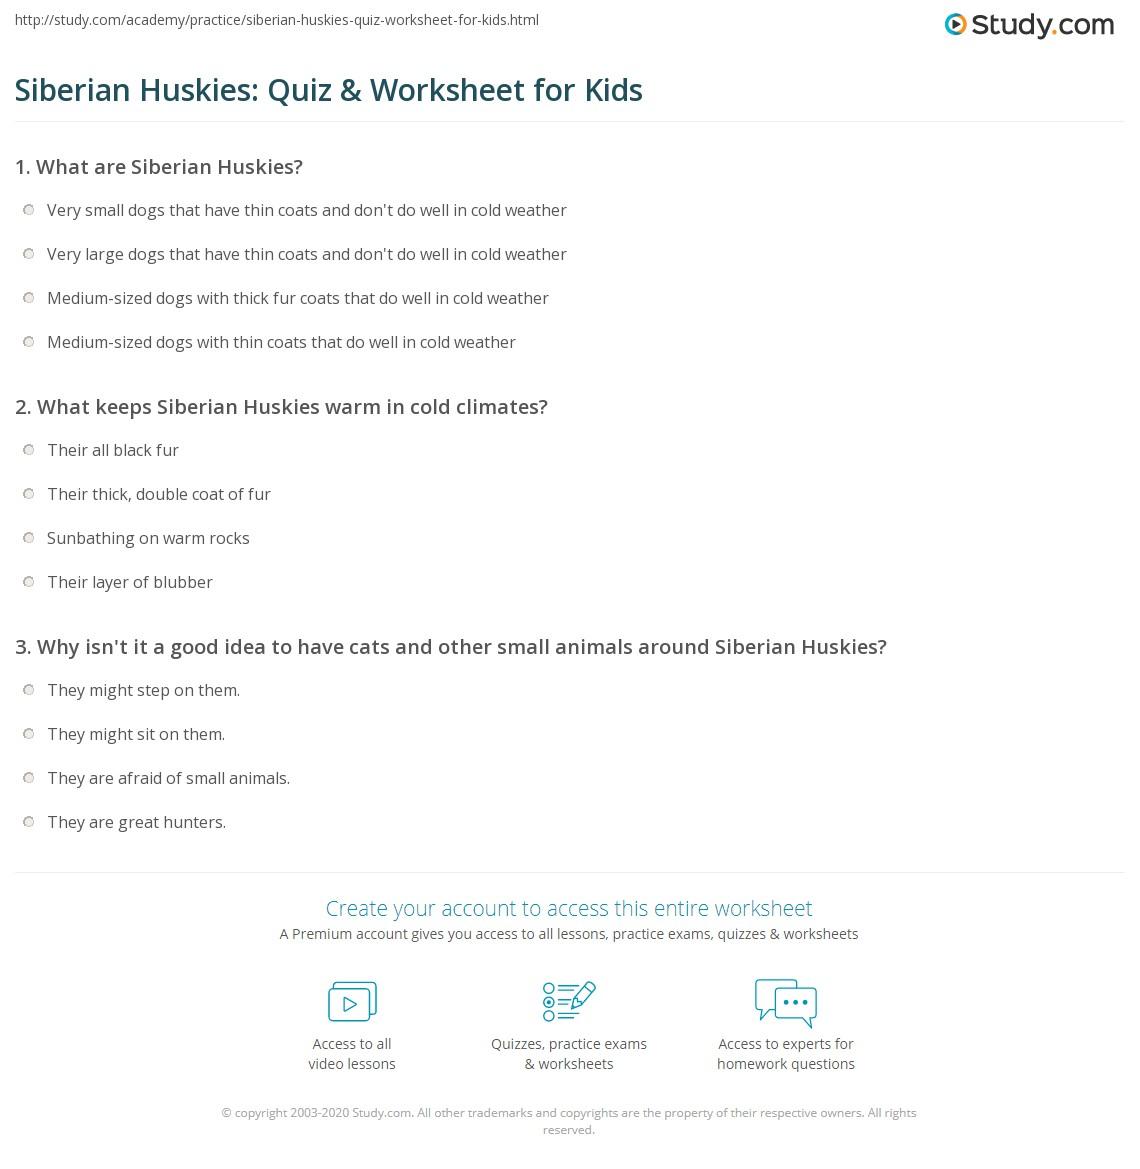 Siberian Huskies: Quiz & Worksheet for Kids | Study.com